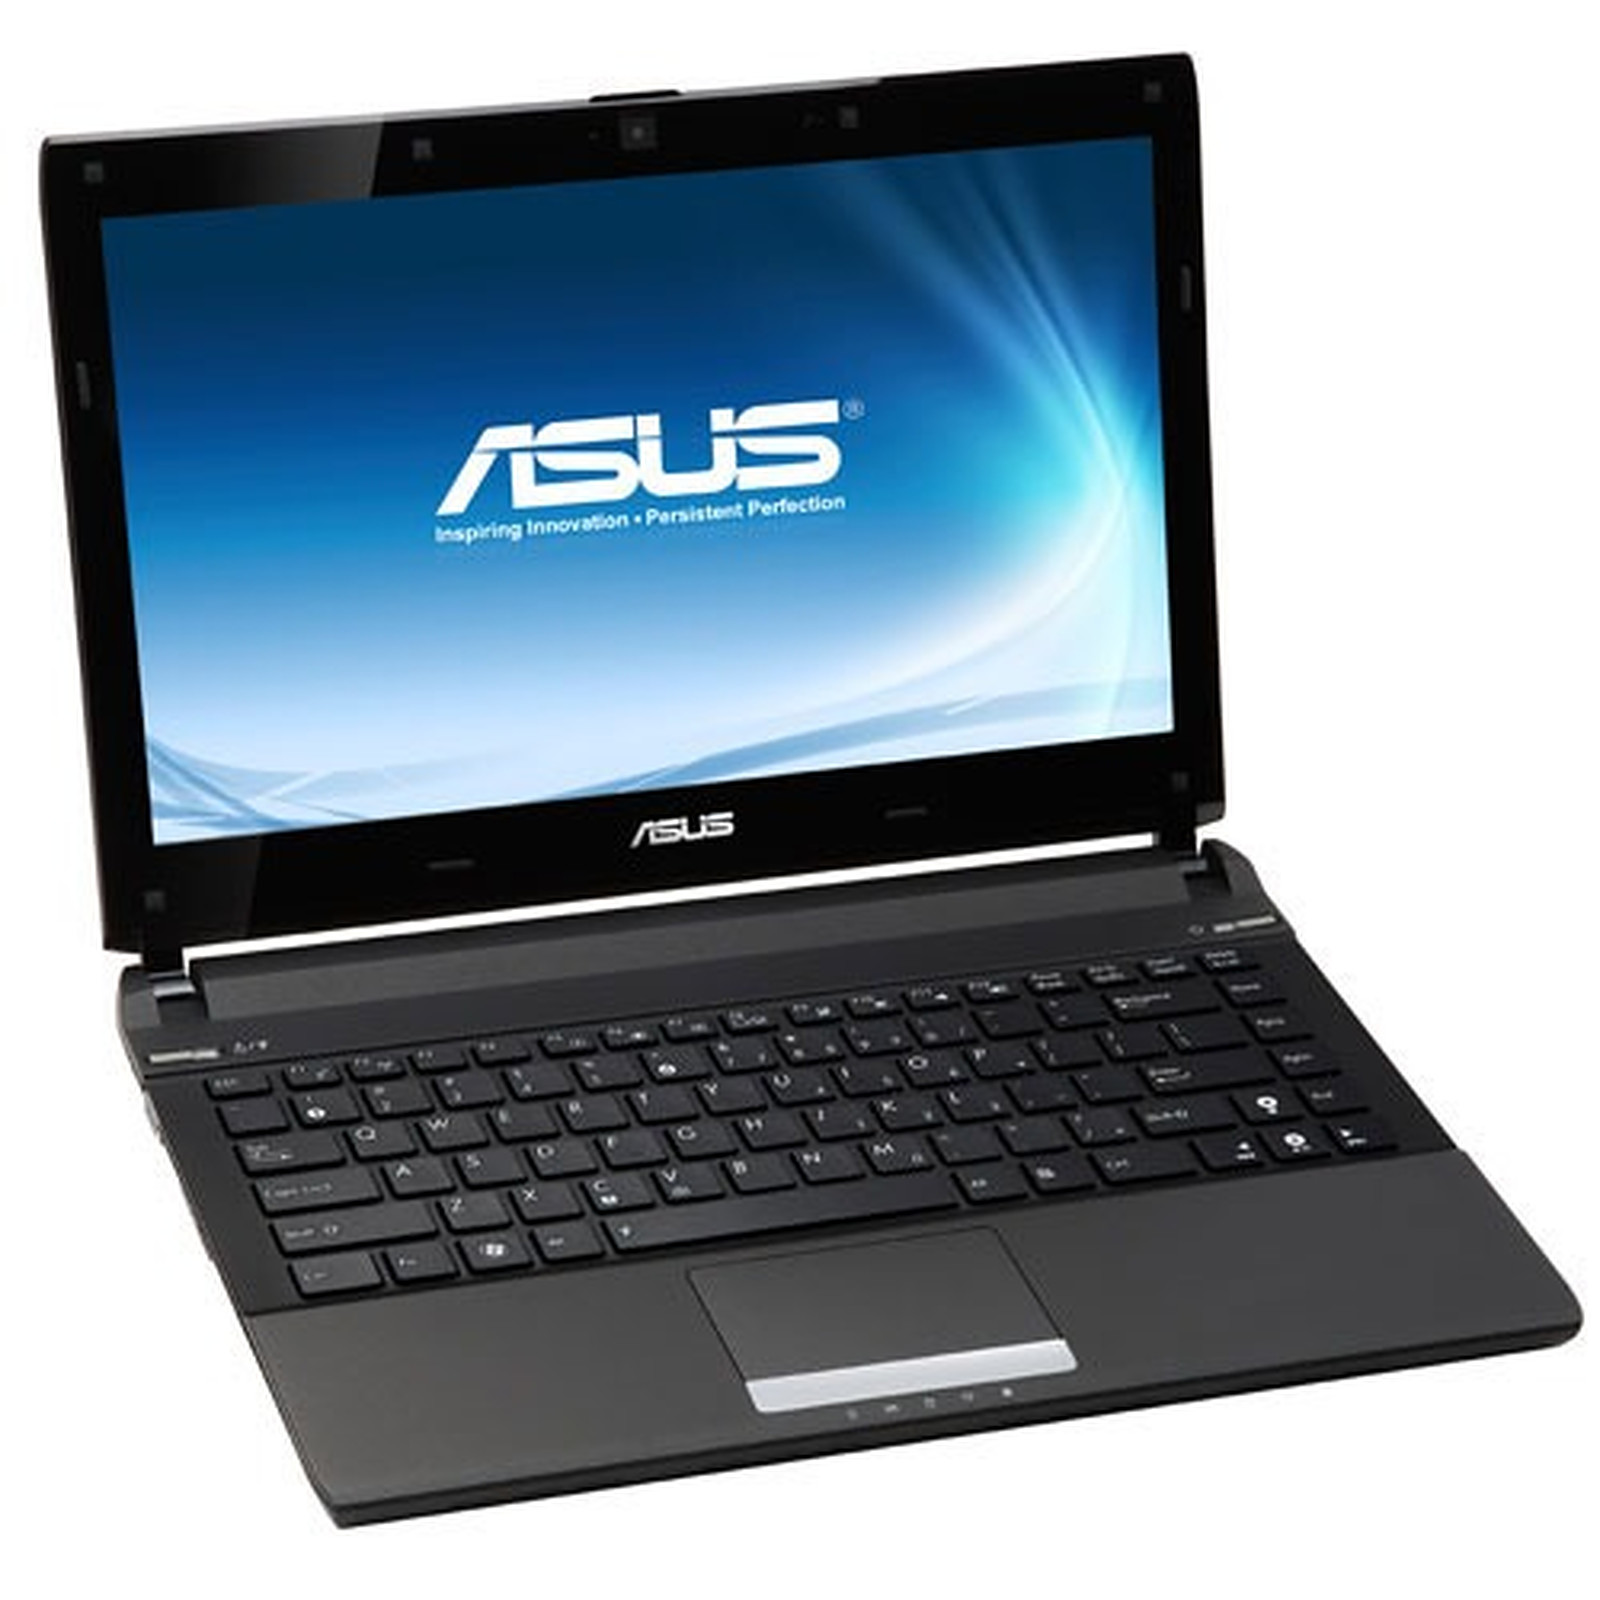 Asus U36SD-RX027X